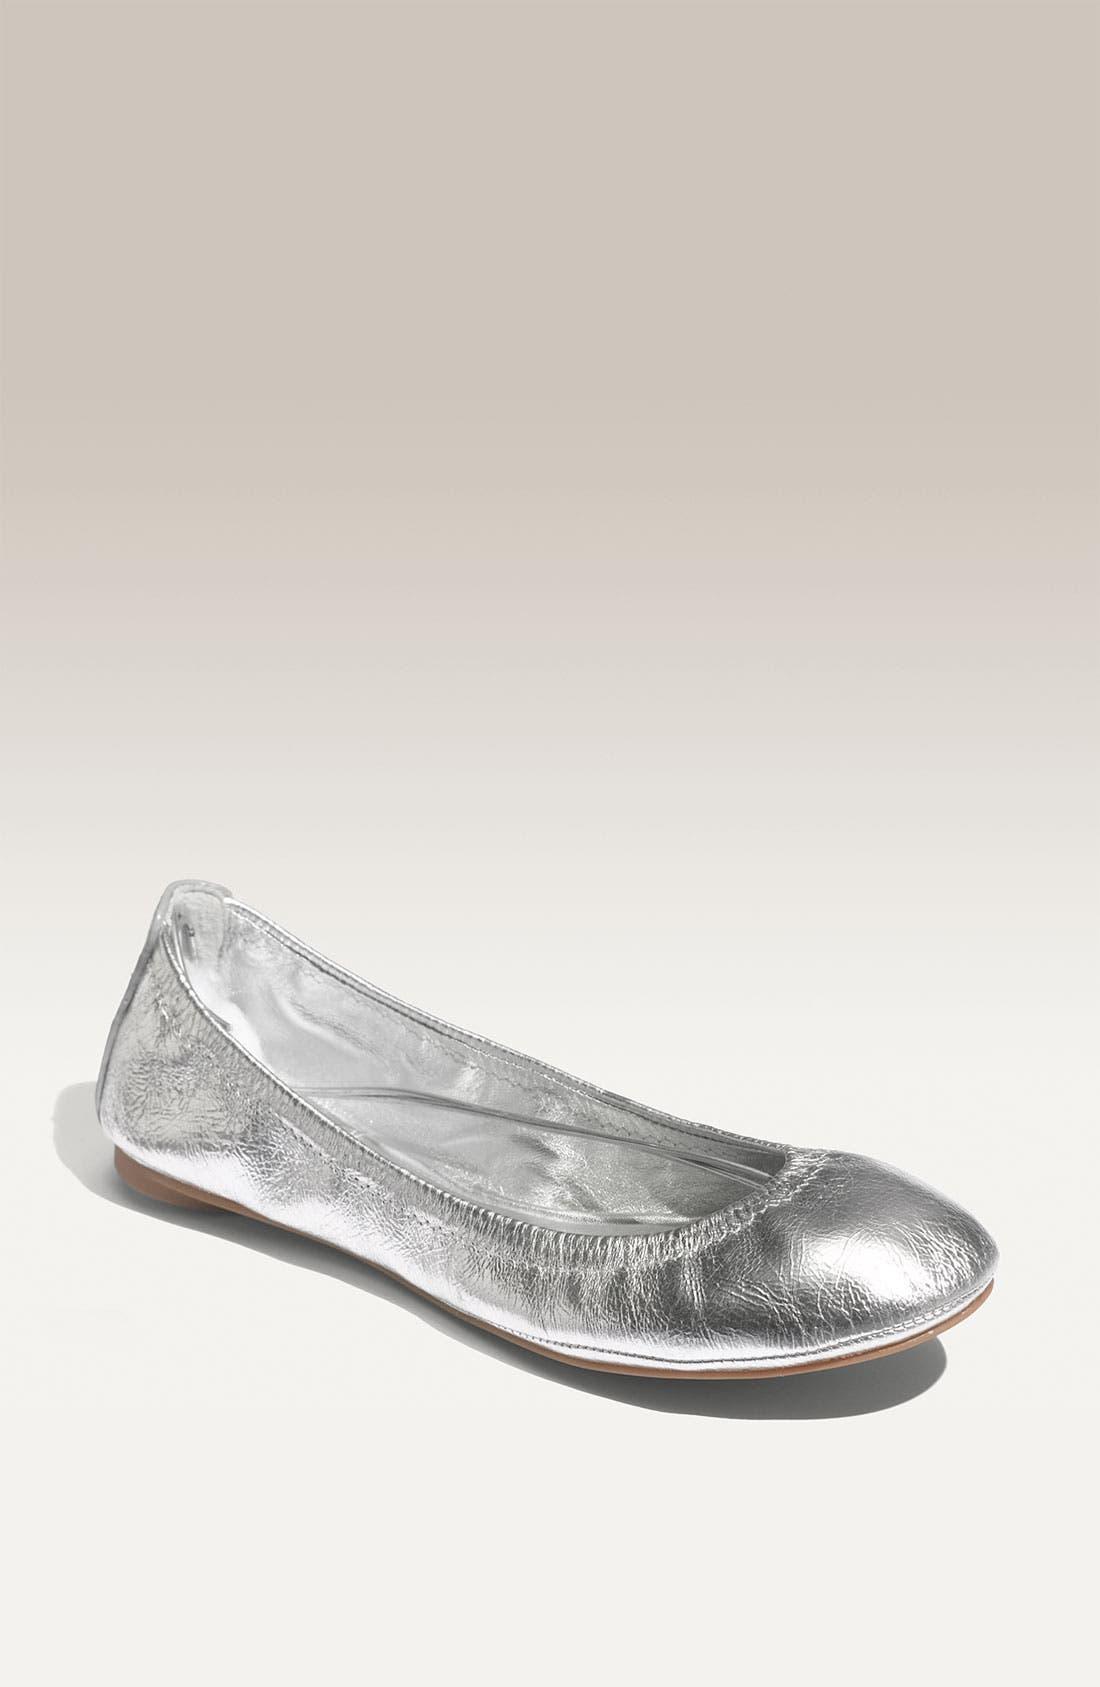 Main Image - Tory Burch 'Eddie' Ballerina Flat